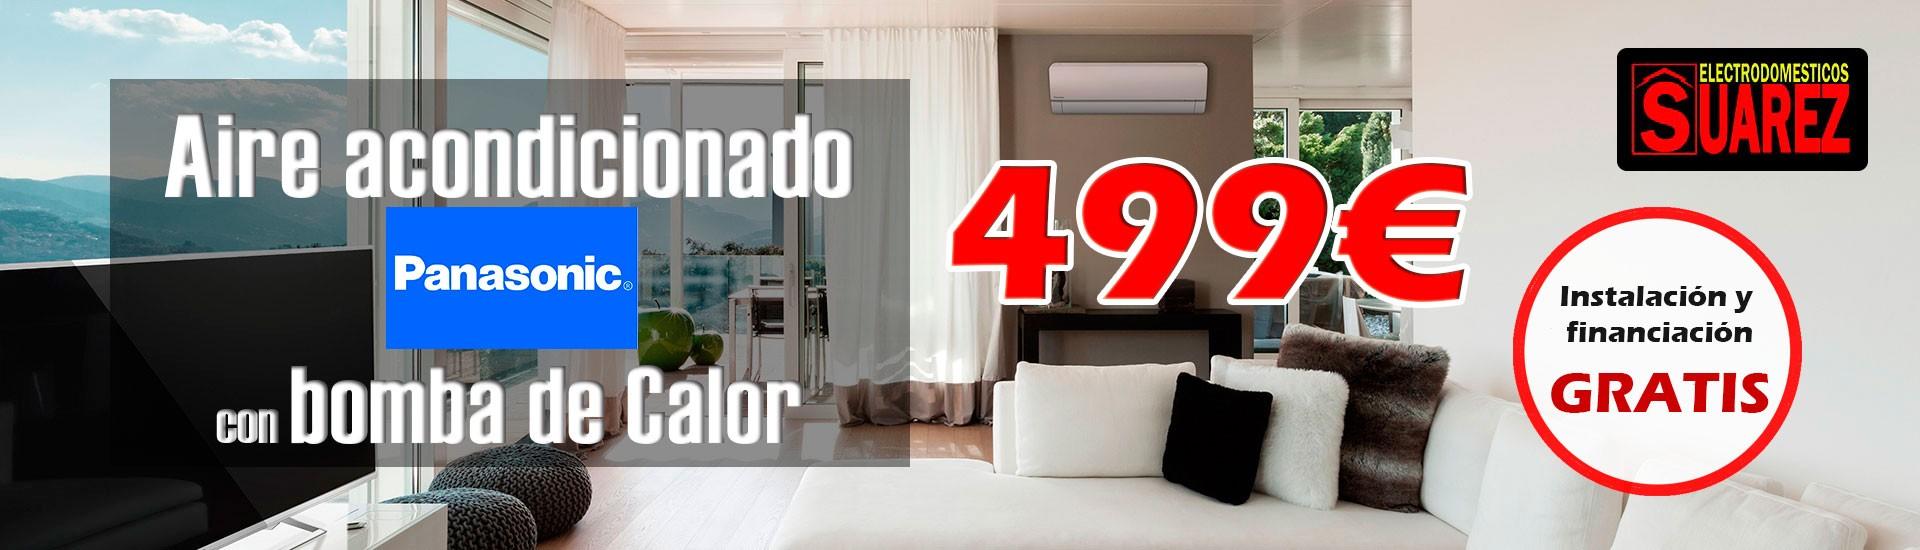 Oferta Aire Acondicionado Panasonic